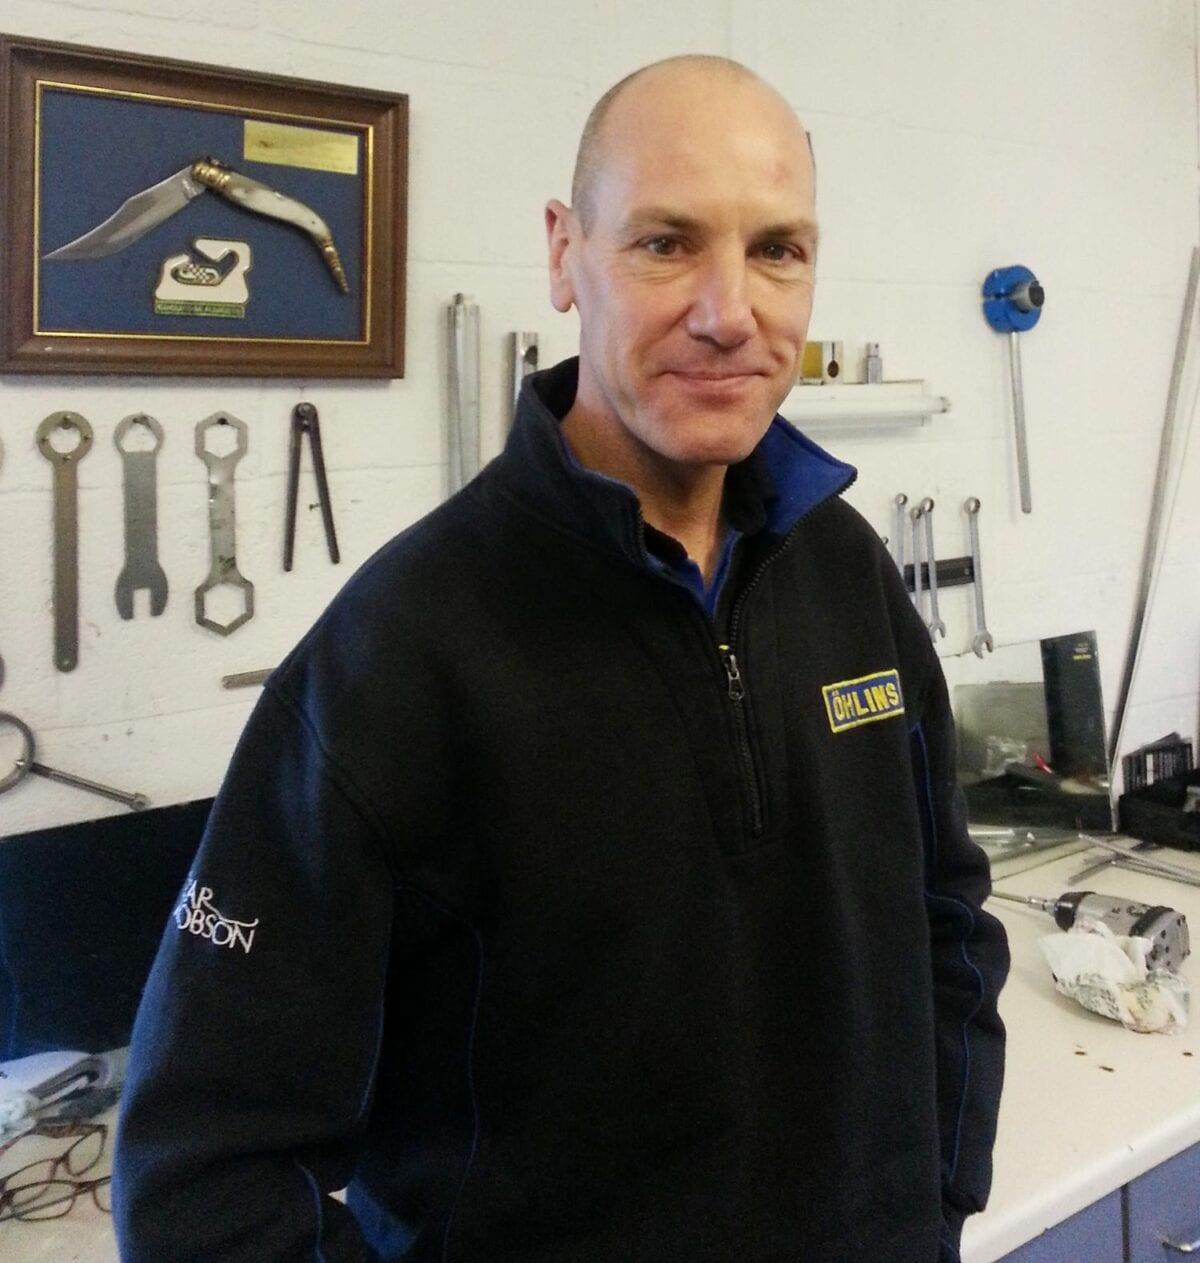 Running-in-an-engine-Rob-Talton